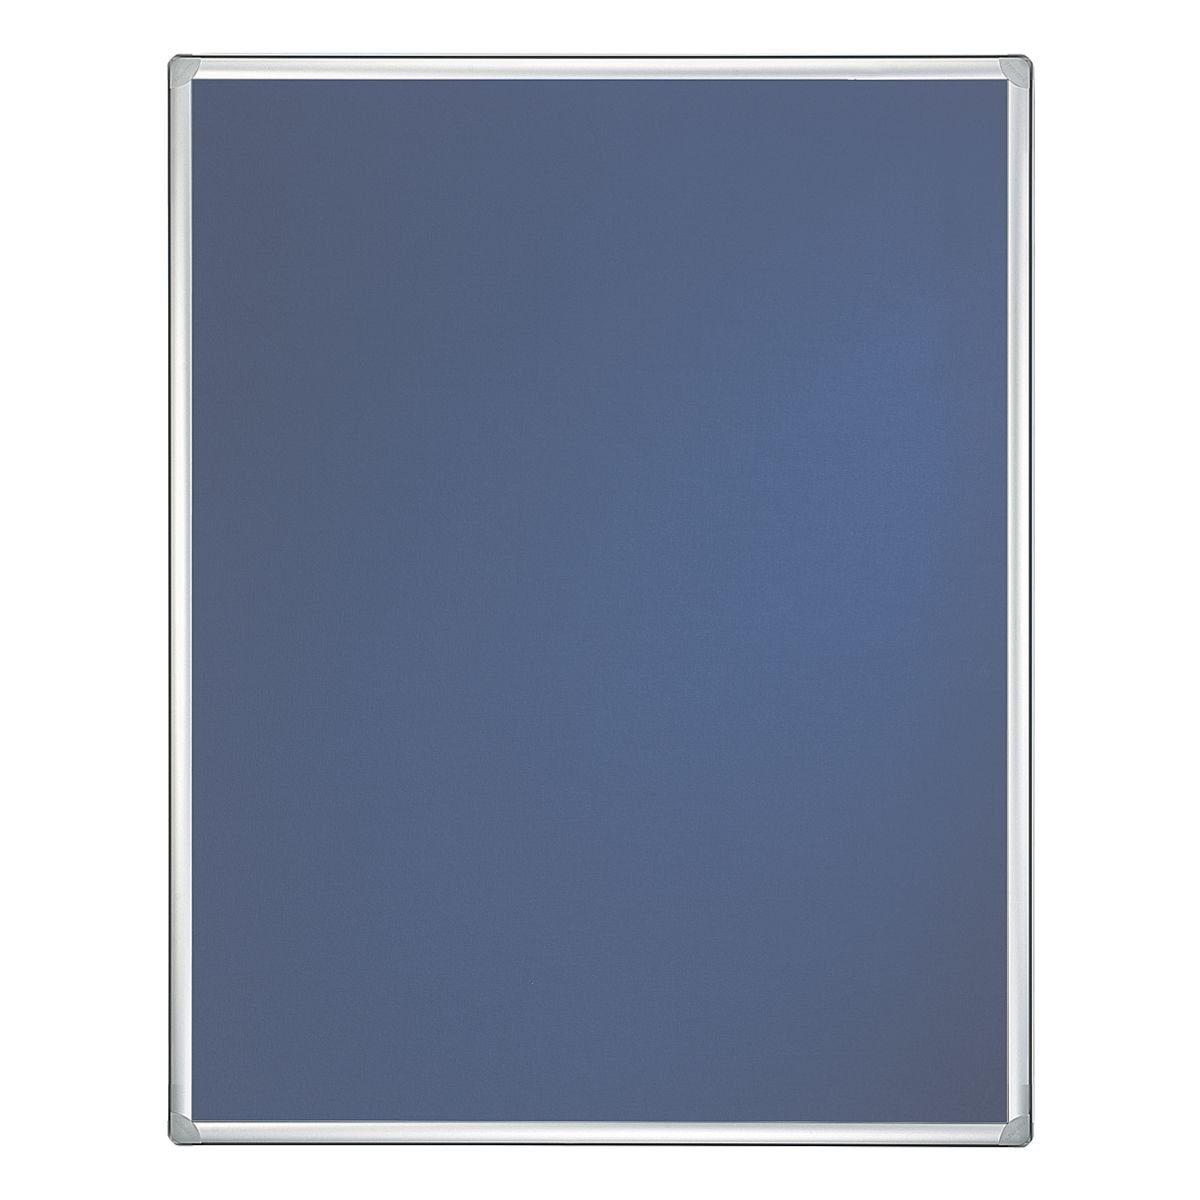 Franken Filz-Pinnwand 180 x 120 cm »PRO PT830503«